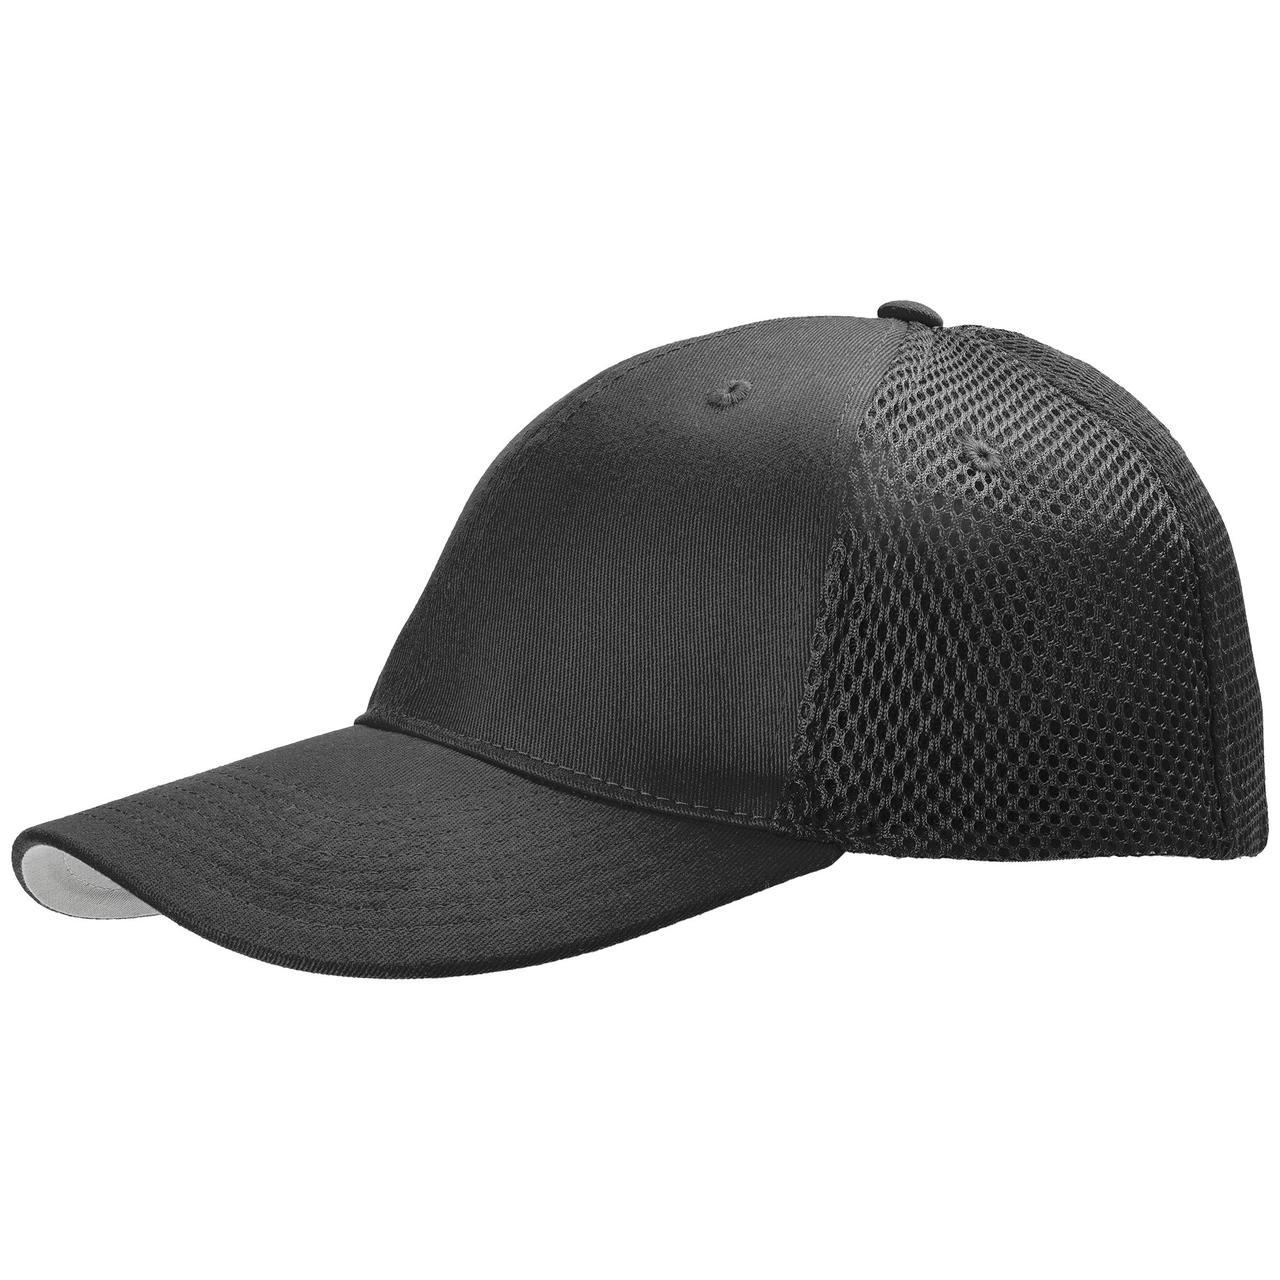 Бейсболка Ronas Hill, черная (артикул 7258.30)